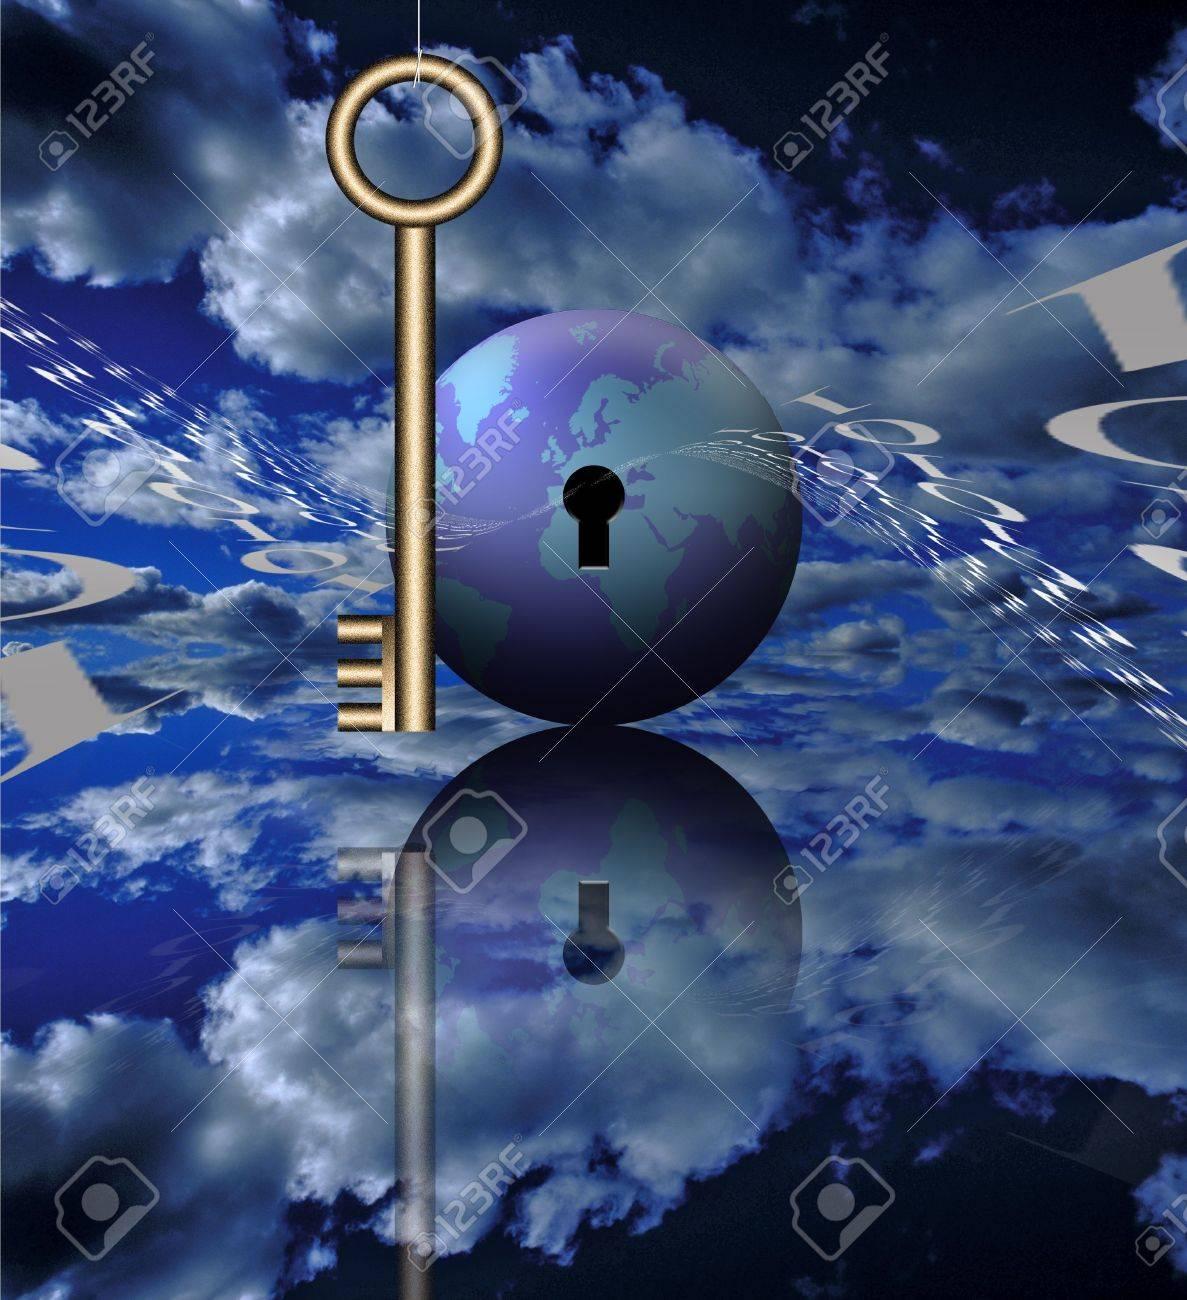 a key binary code and the globe stock photo picture and royalty a key binary code and the globe stock photo 2109850